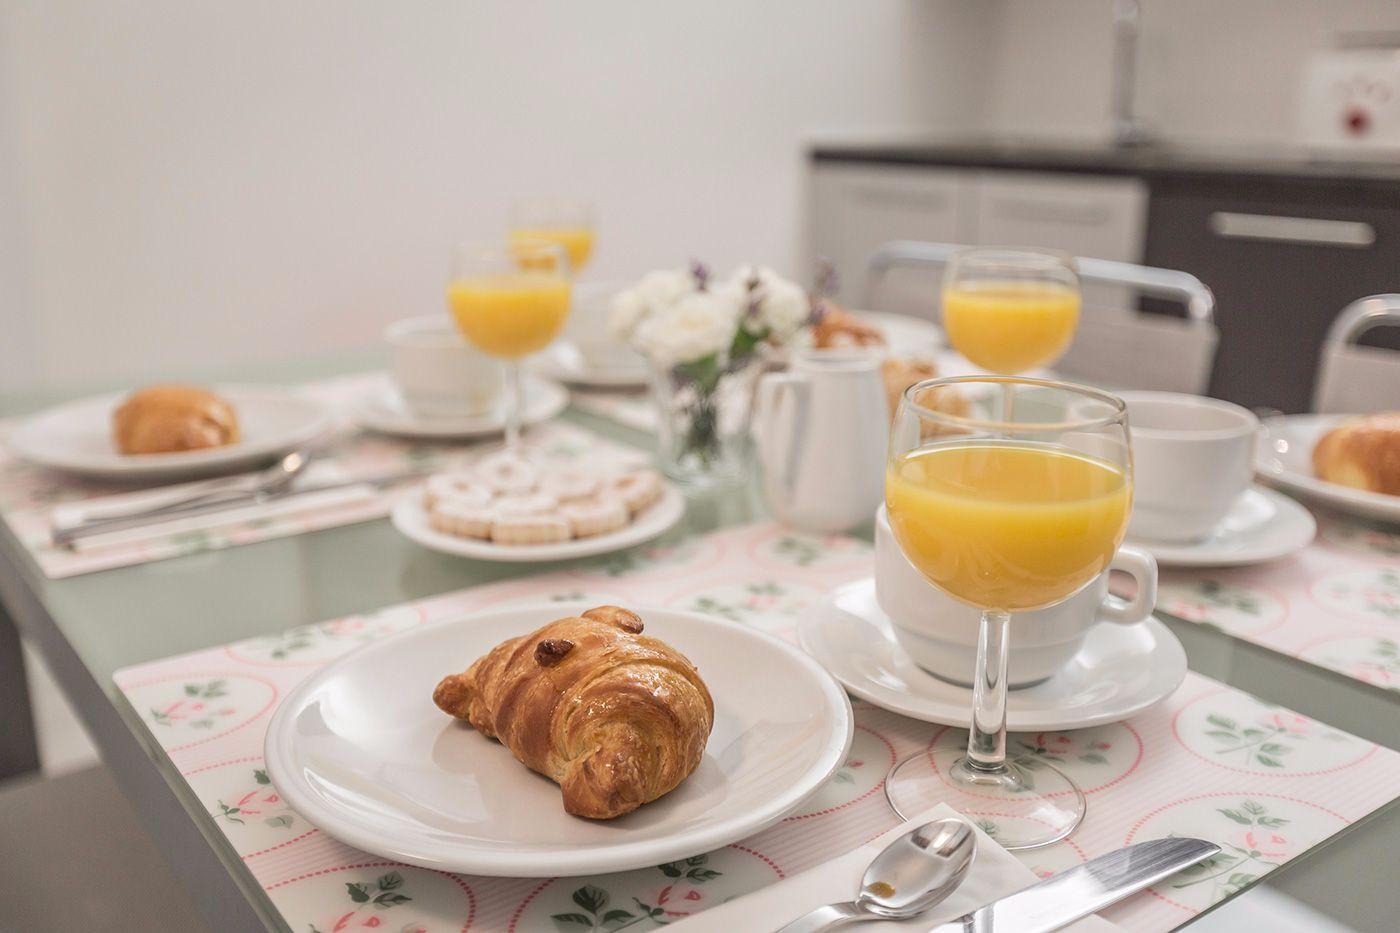 ...or for delicious Italian breakfast!